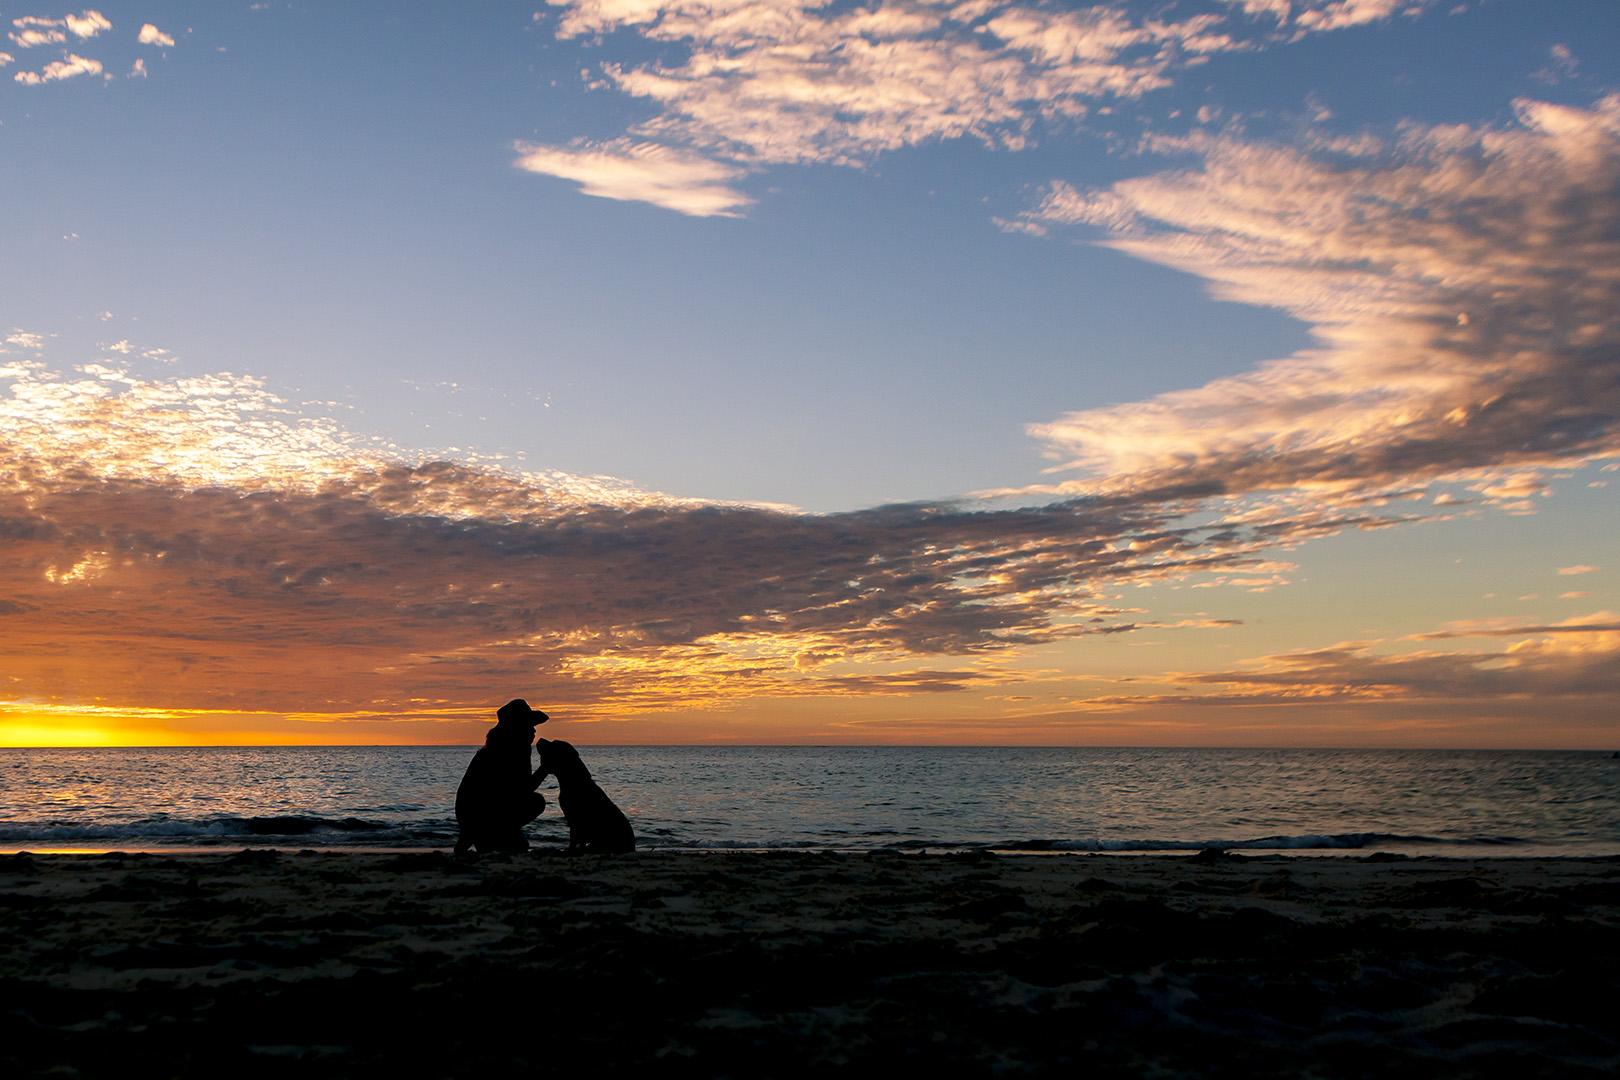 IMG_2575-Hillarys Beach dog silhouette photos.jpg